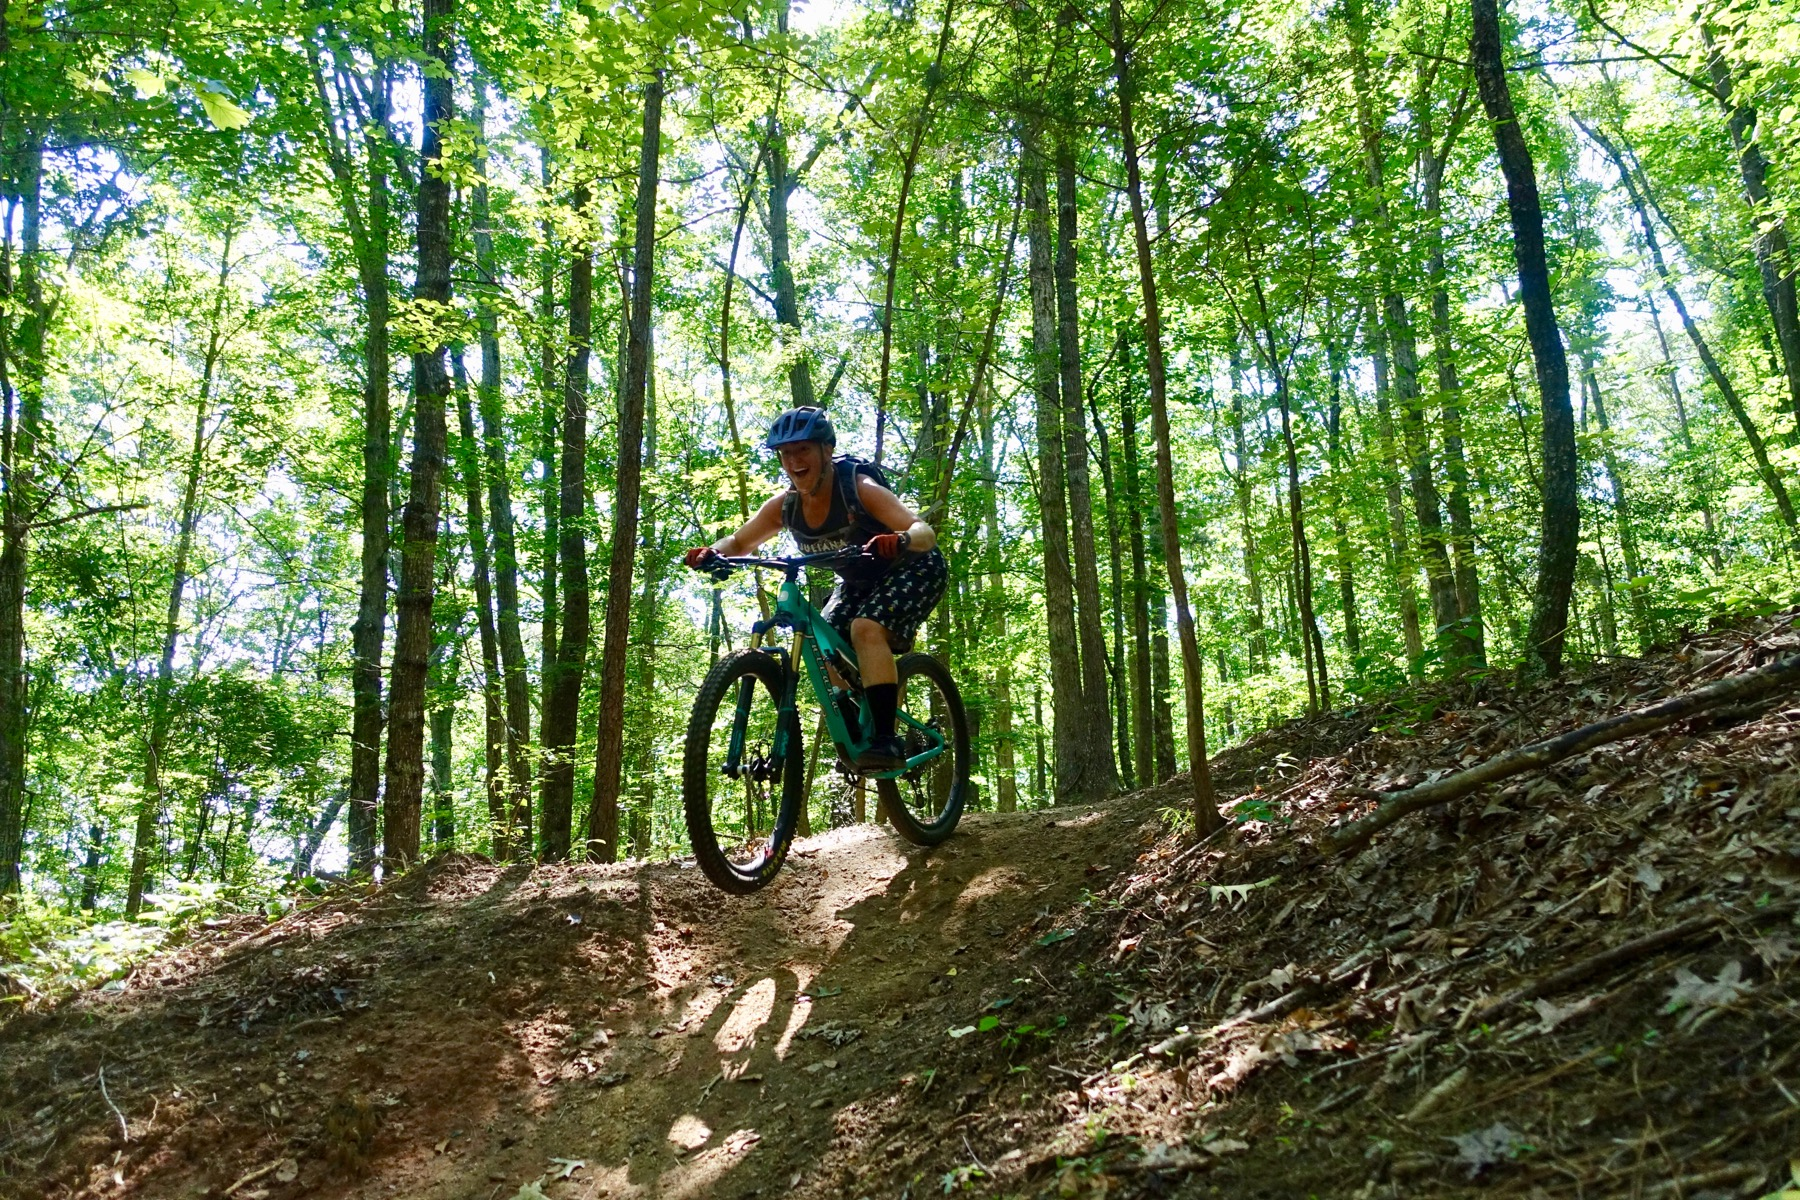 New Mountain Bike Trail Openings - July 2019 - Singletracks Mountain Bike News